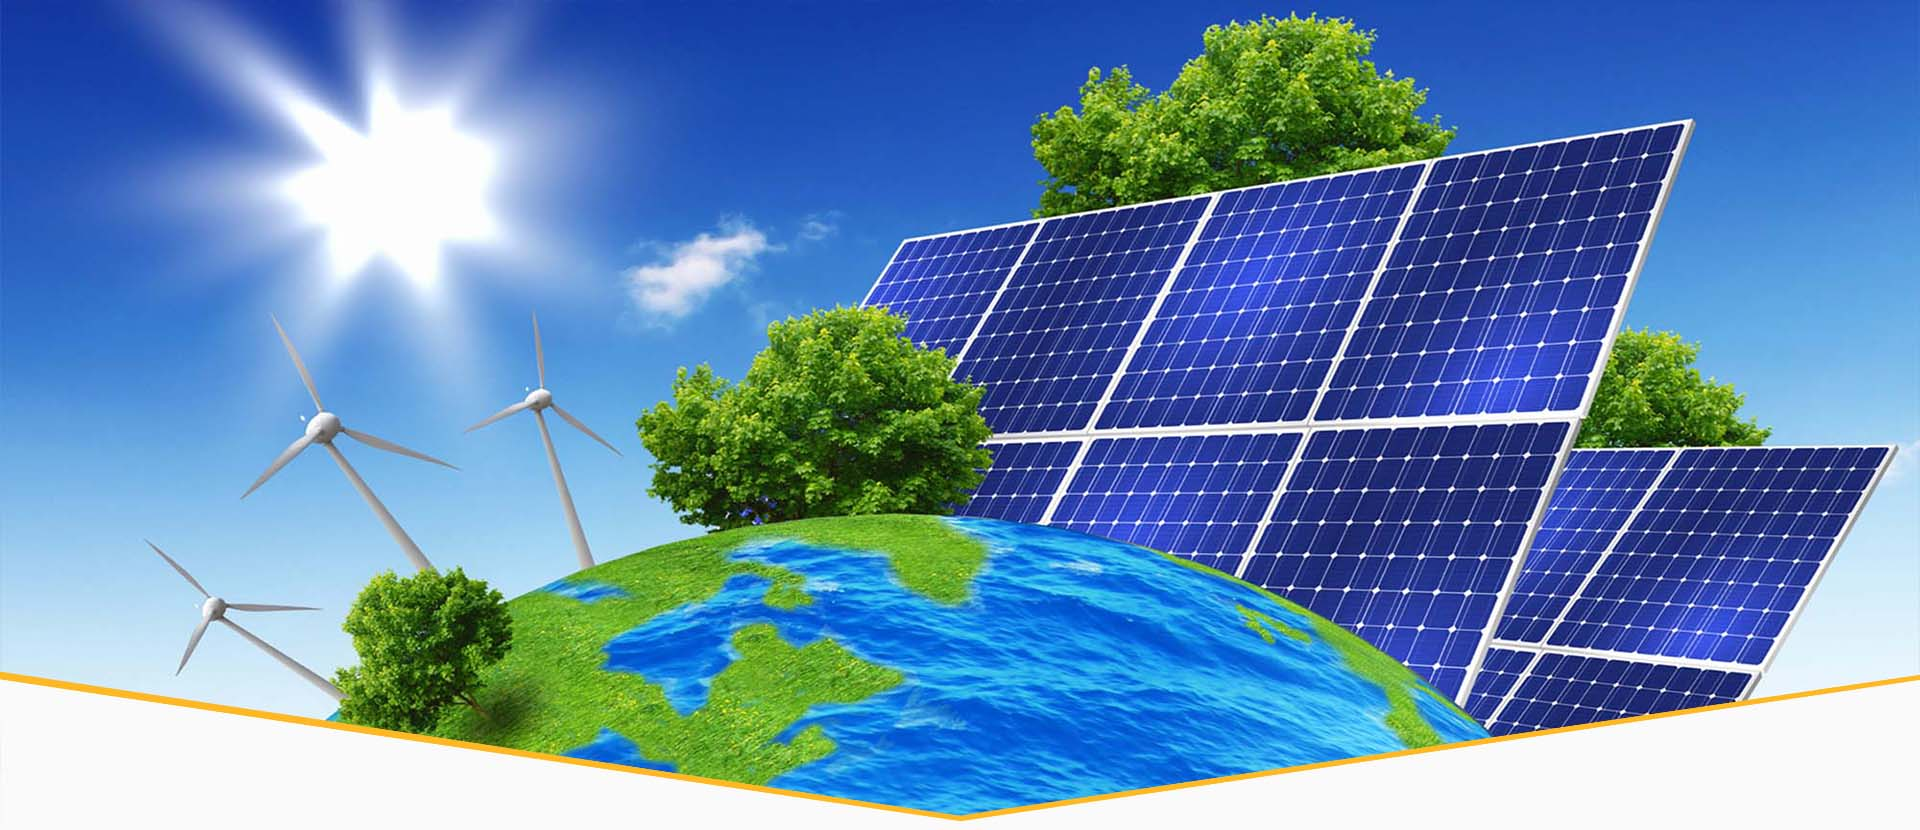 pasargad energy development company